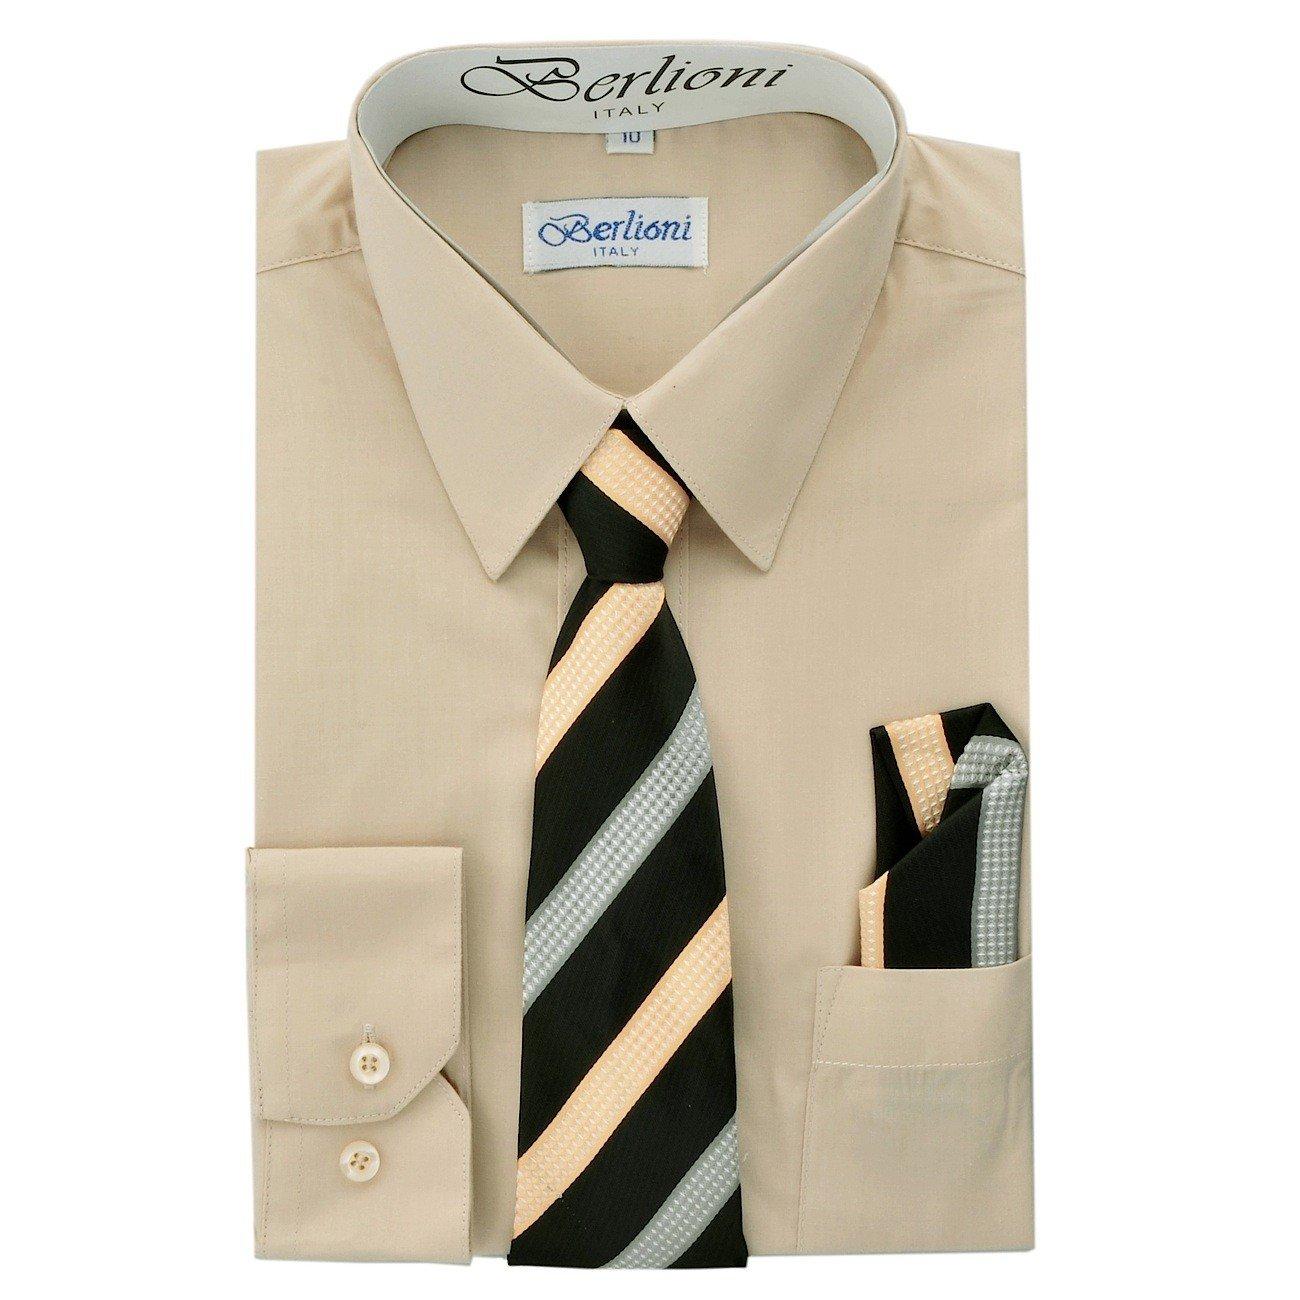 712 Elegant Boys Button Down Khaki Dress Shirt//Necktie//Hanky